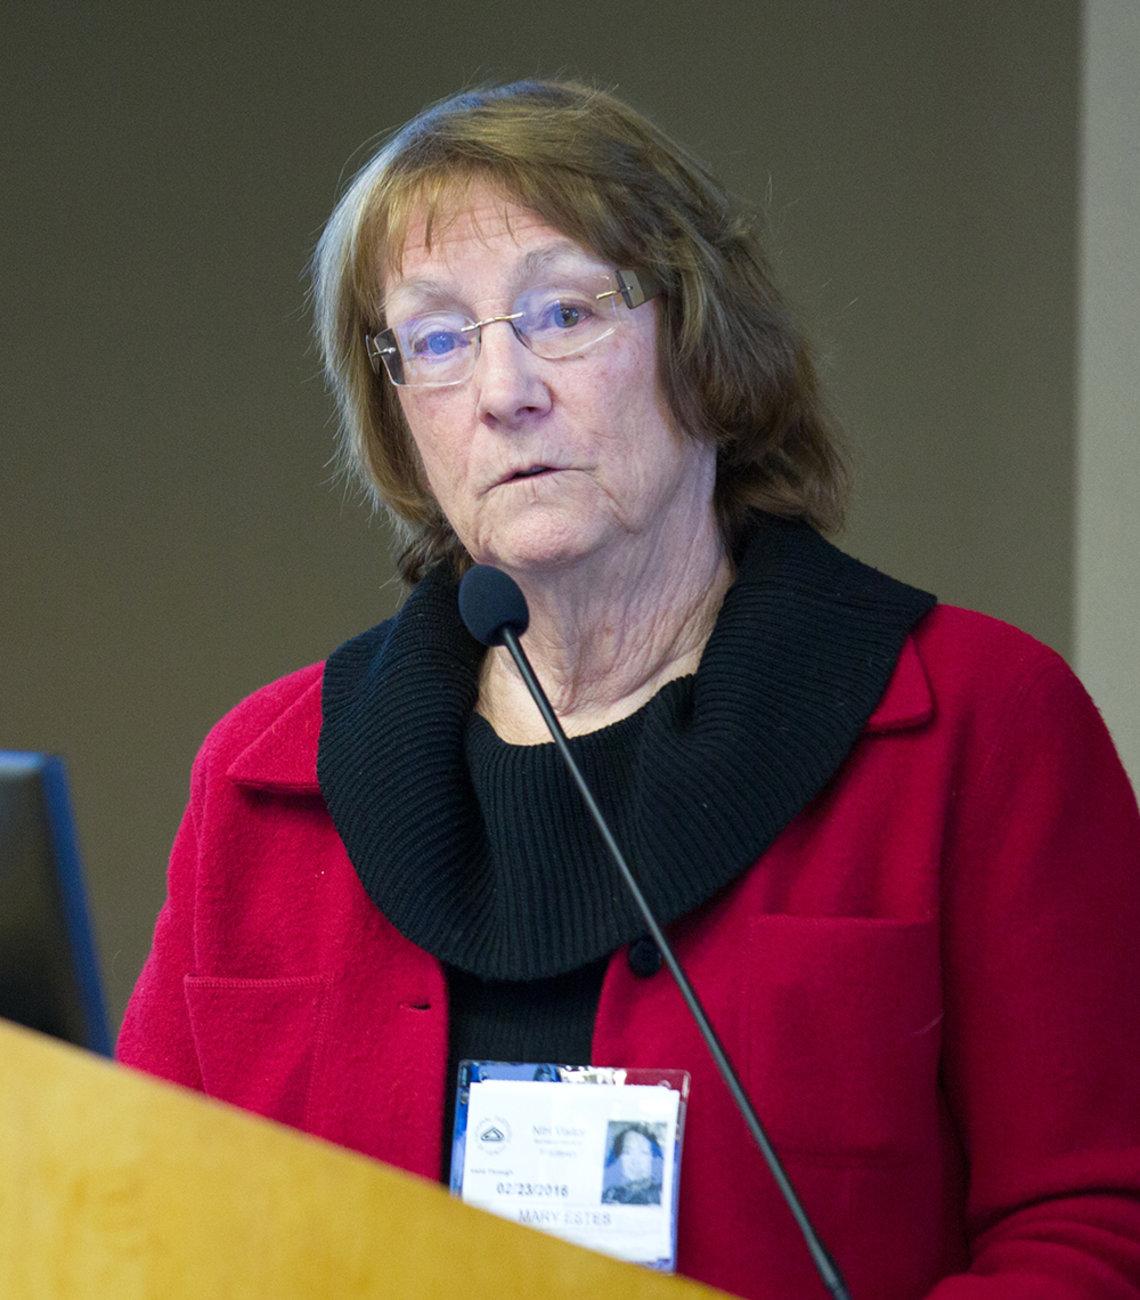 Dr. Mary K. Estes